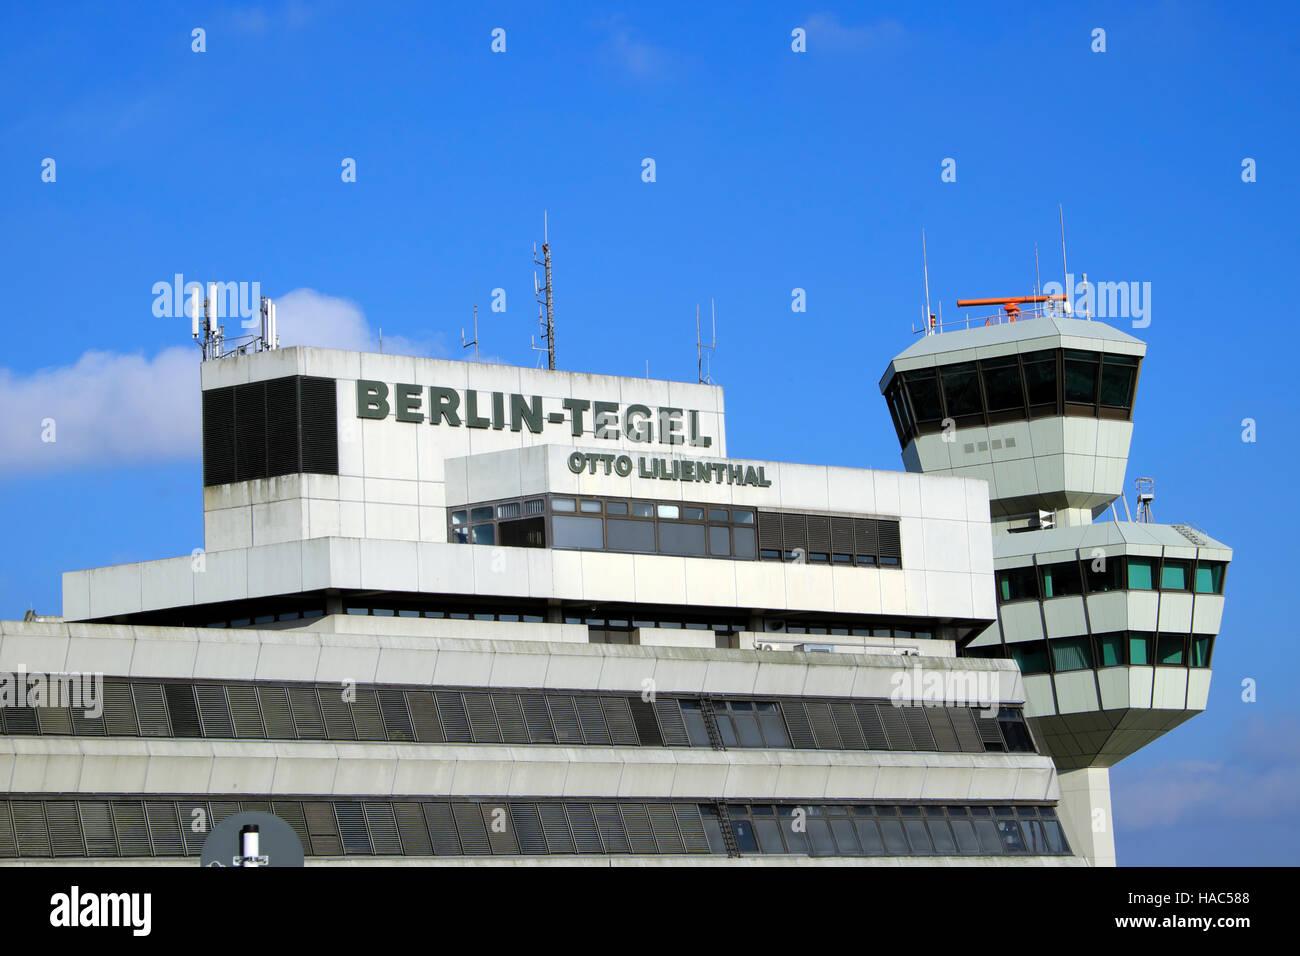 Berlin Tegel Airport Stock Photos & Berlin Tegel Airport ...